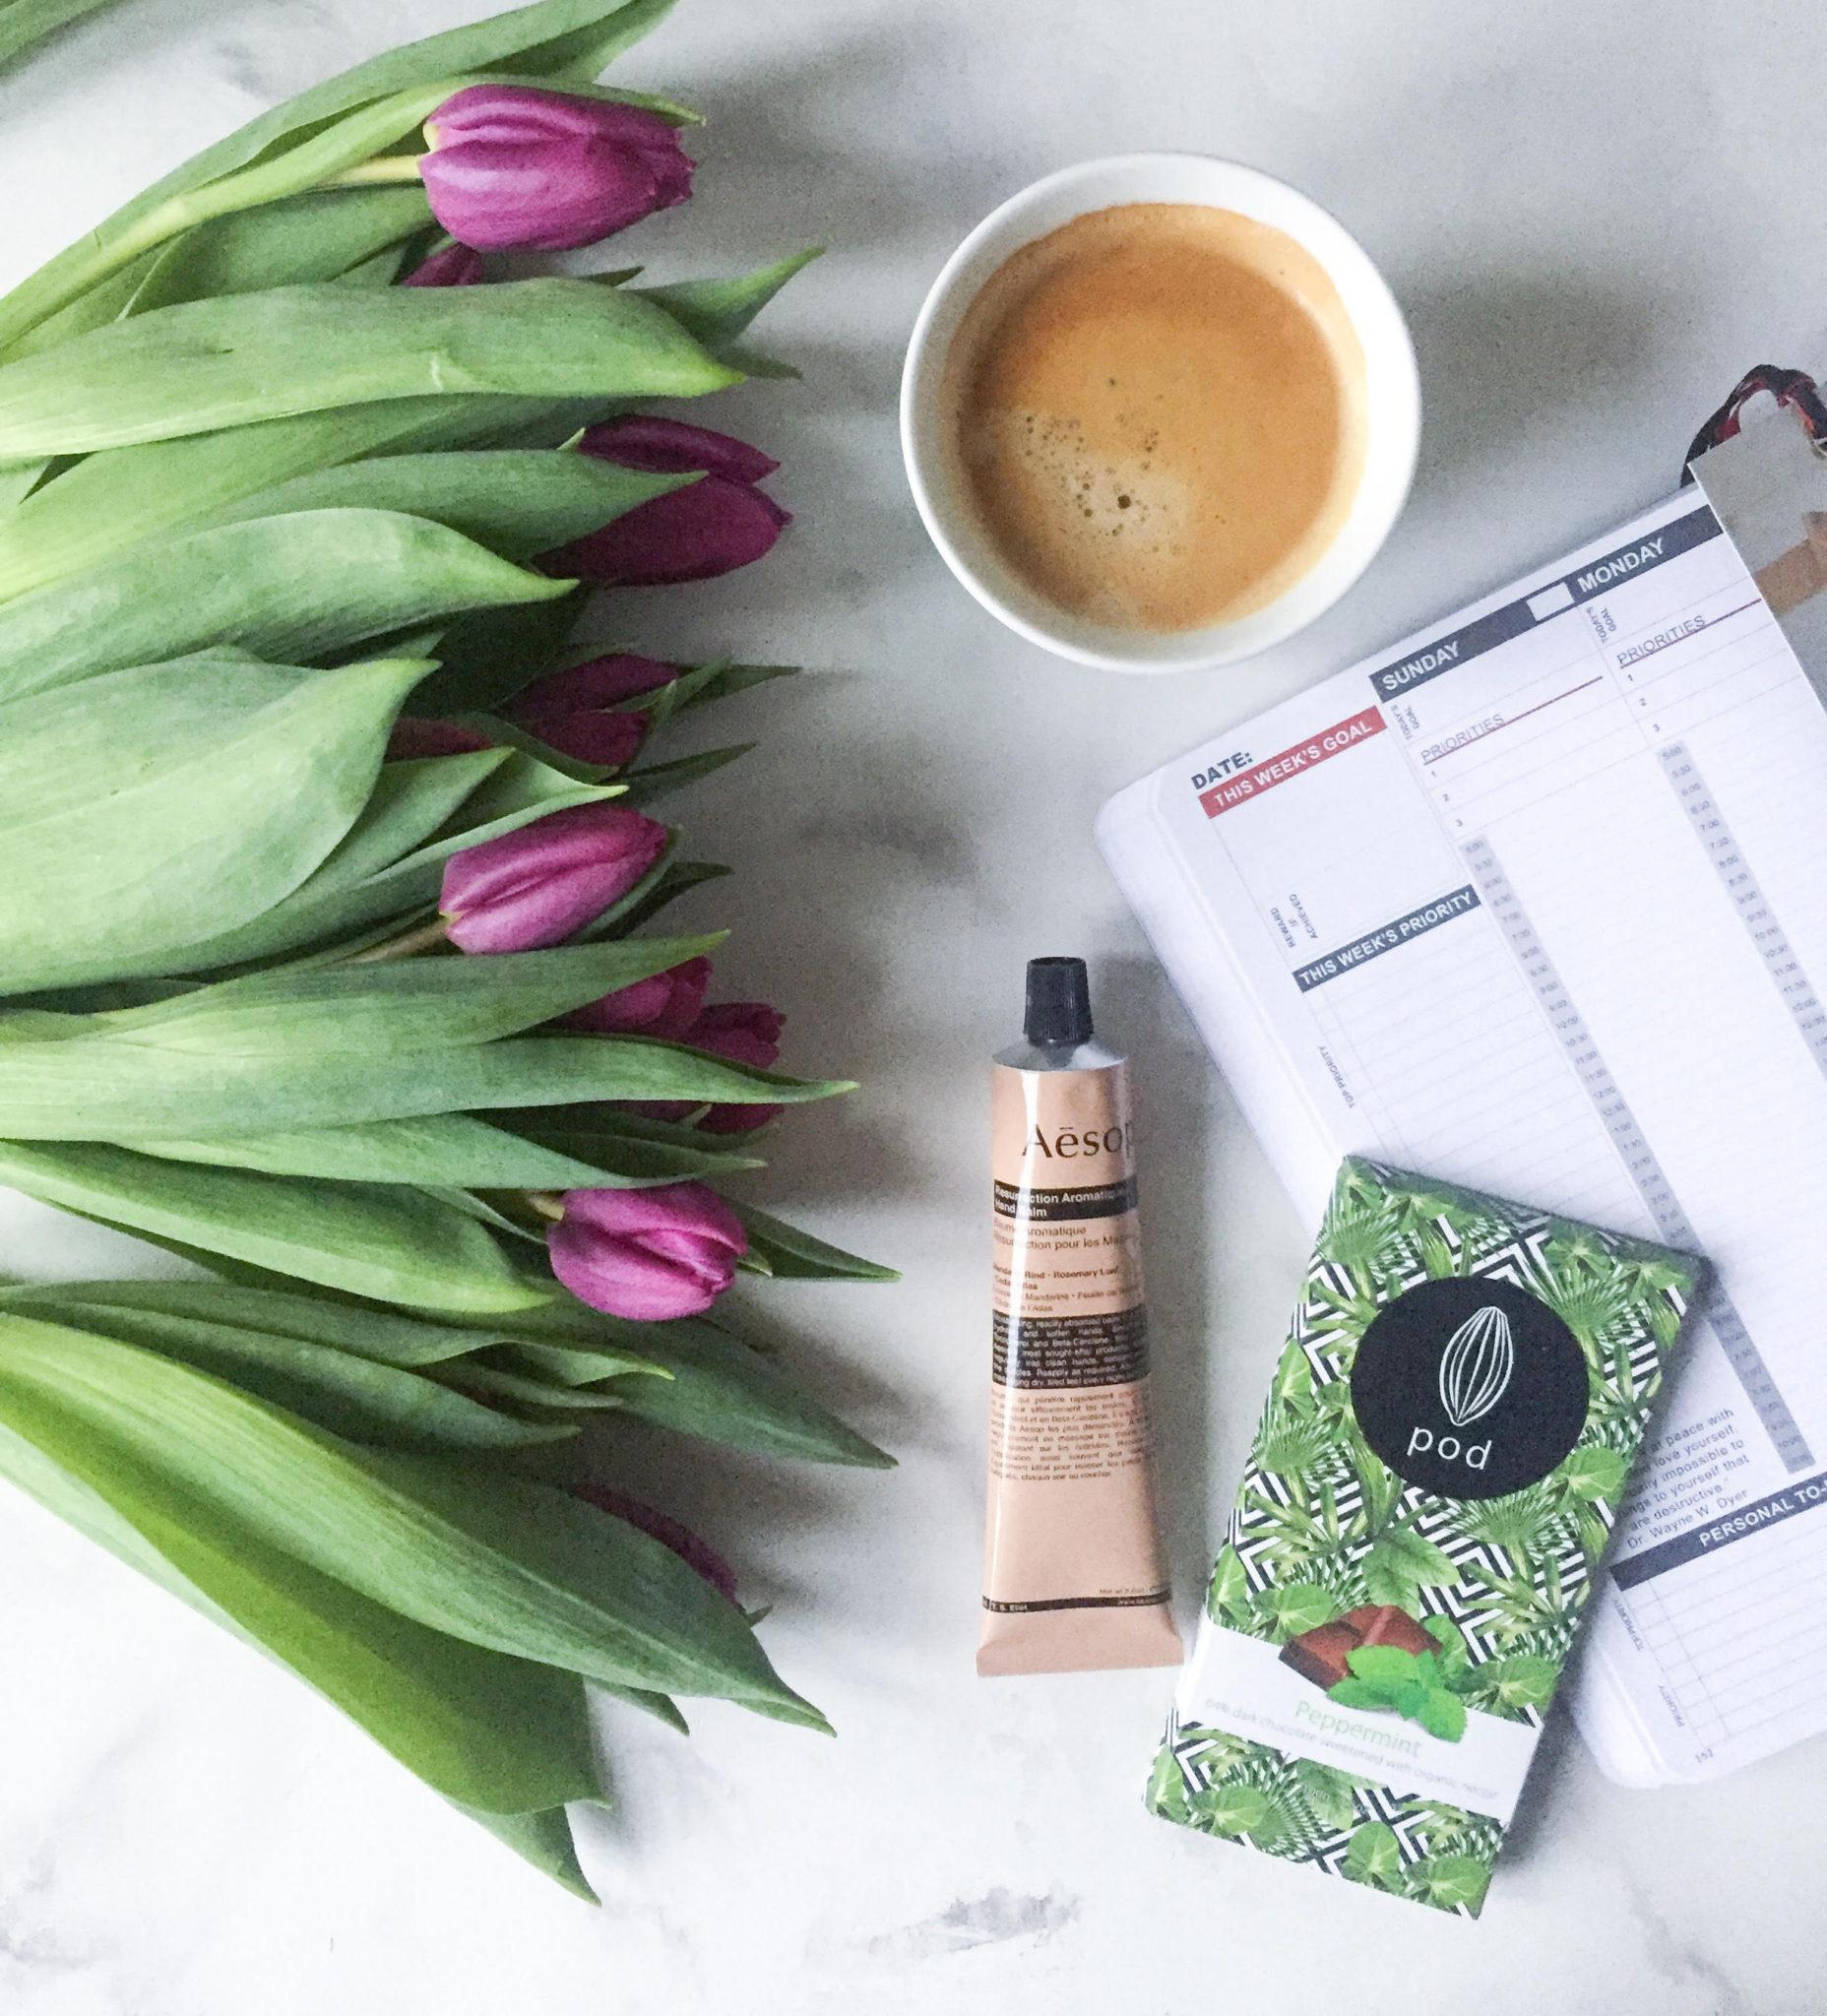 januar 2018 kalender og pod chokolade, kaffe og tulipaner